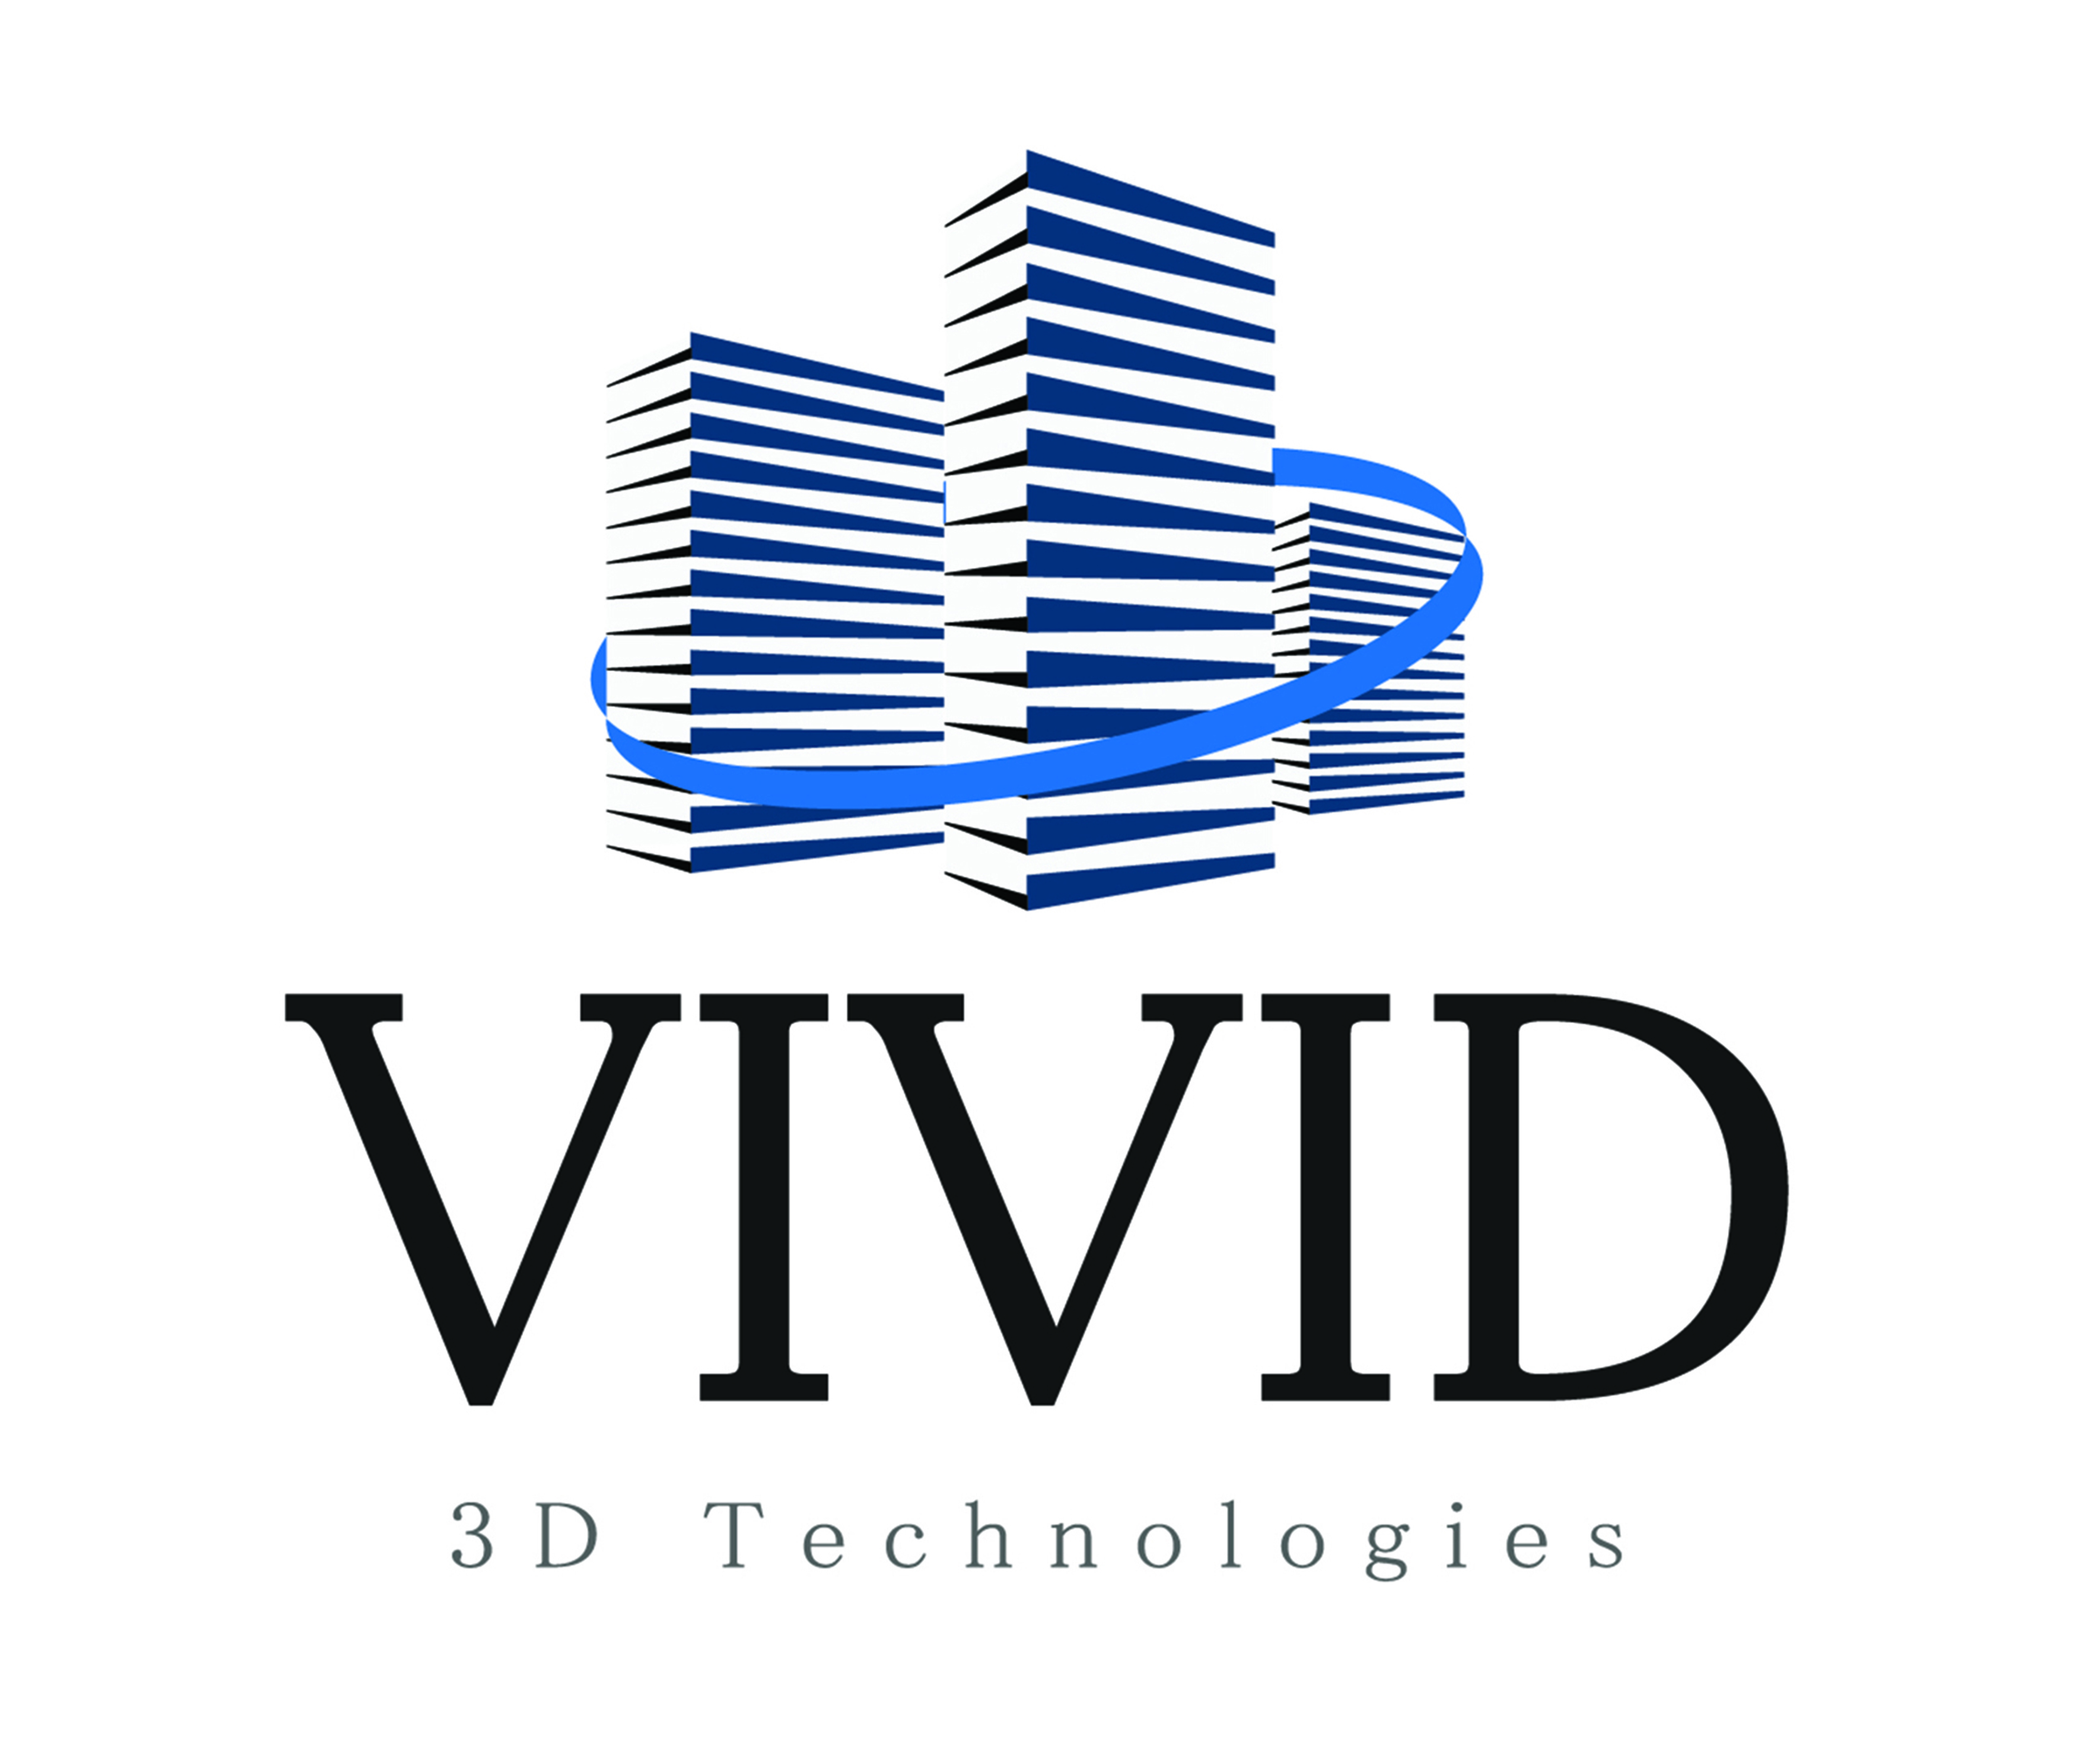 Vivid 3D Technology